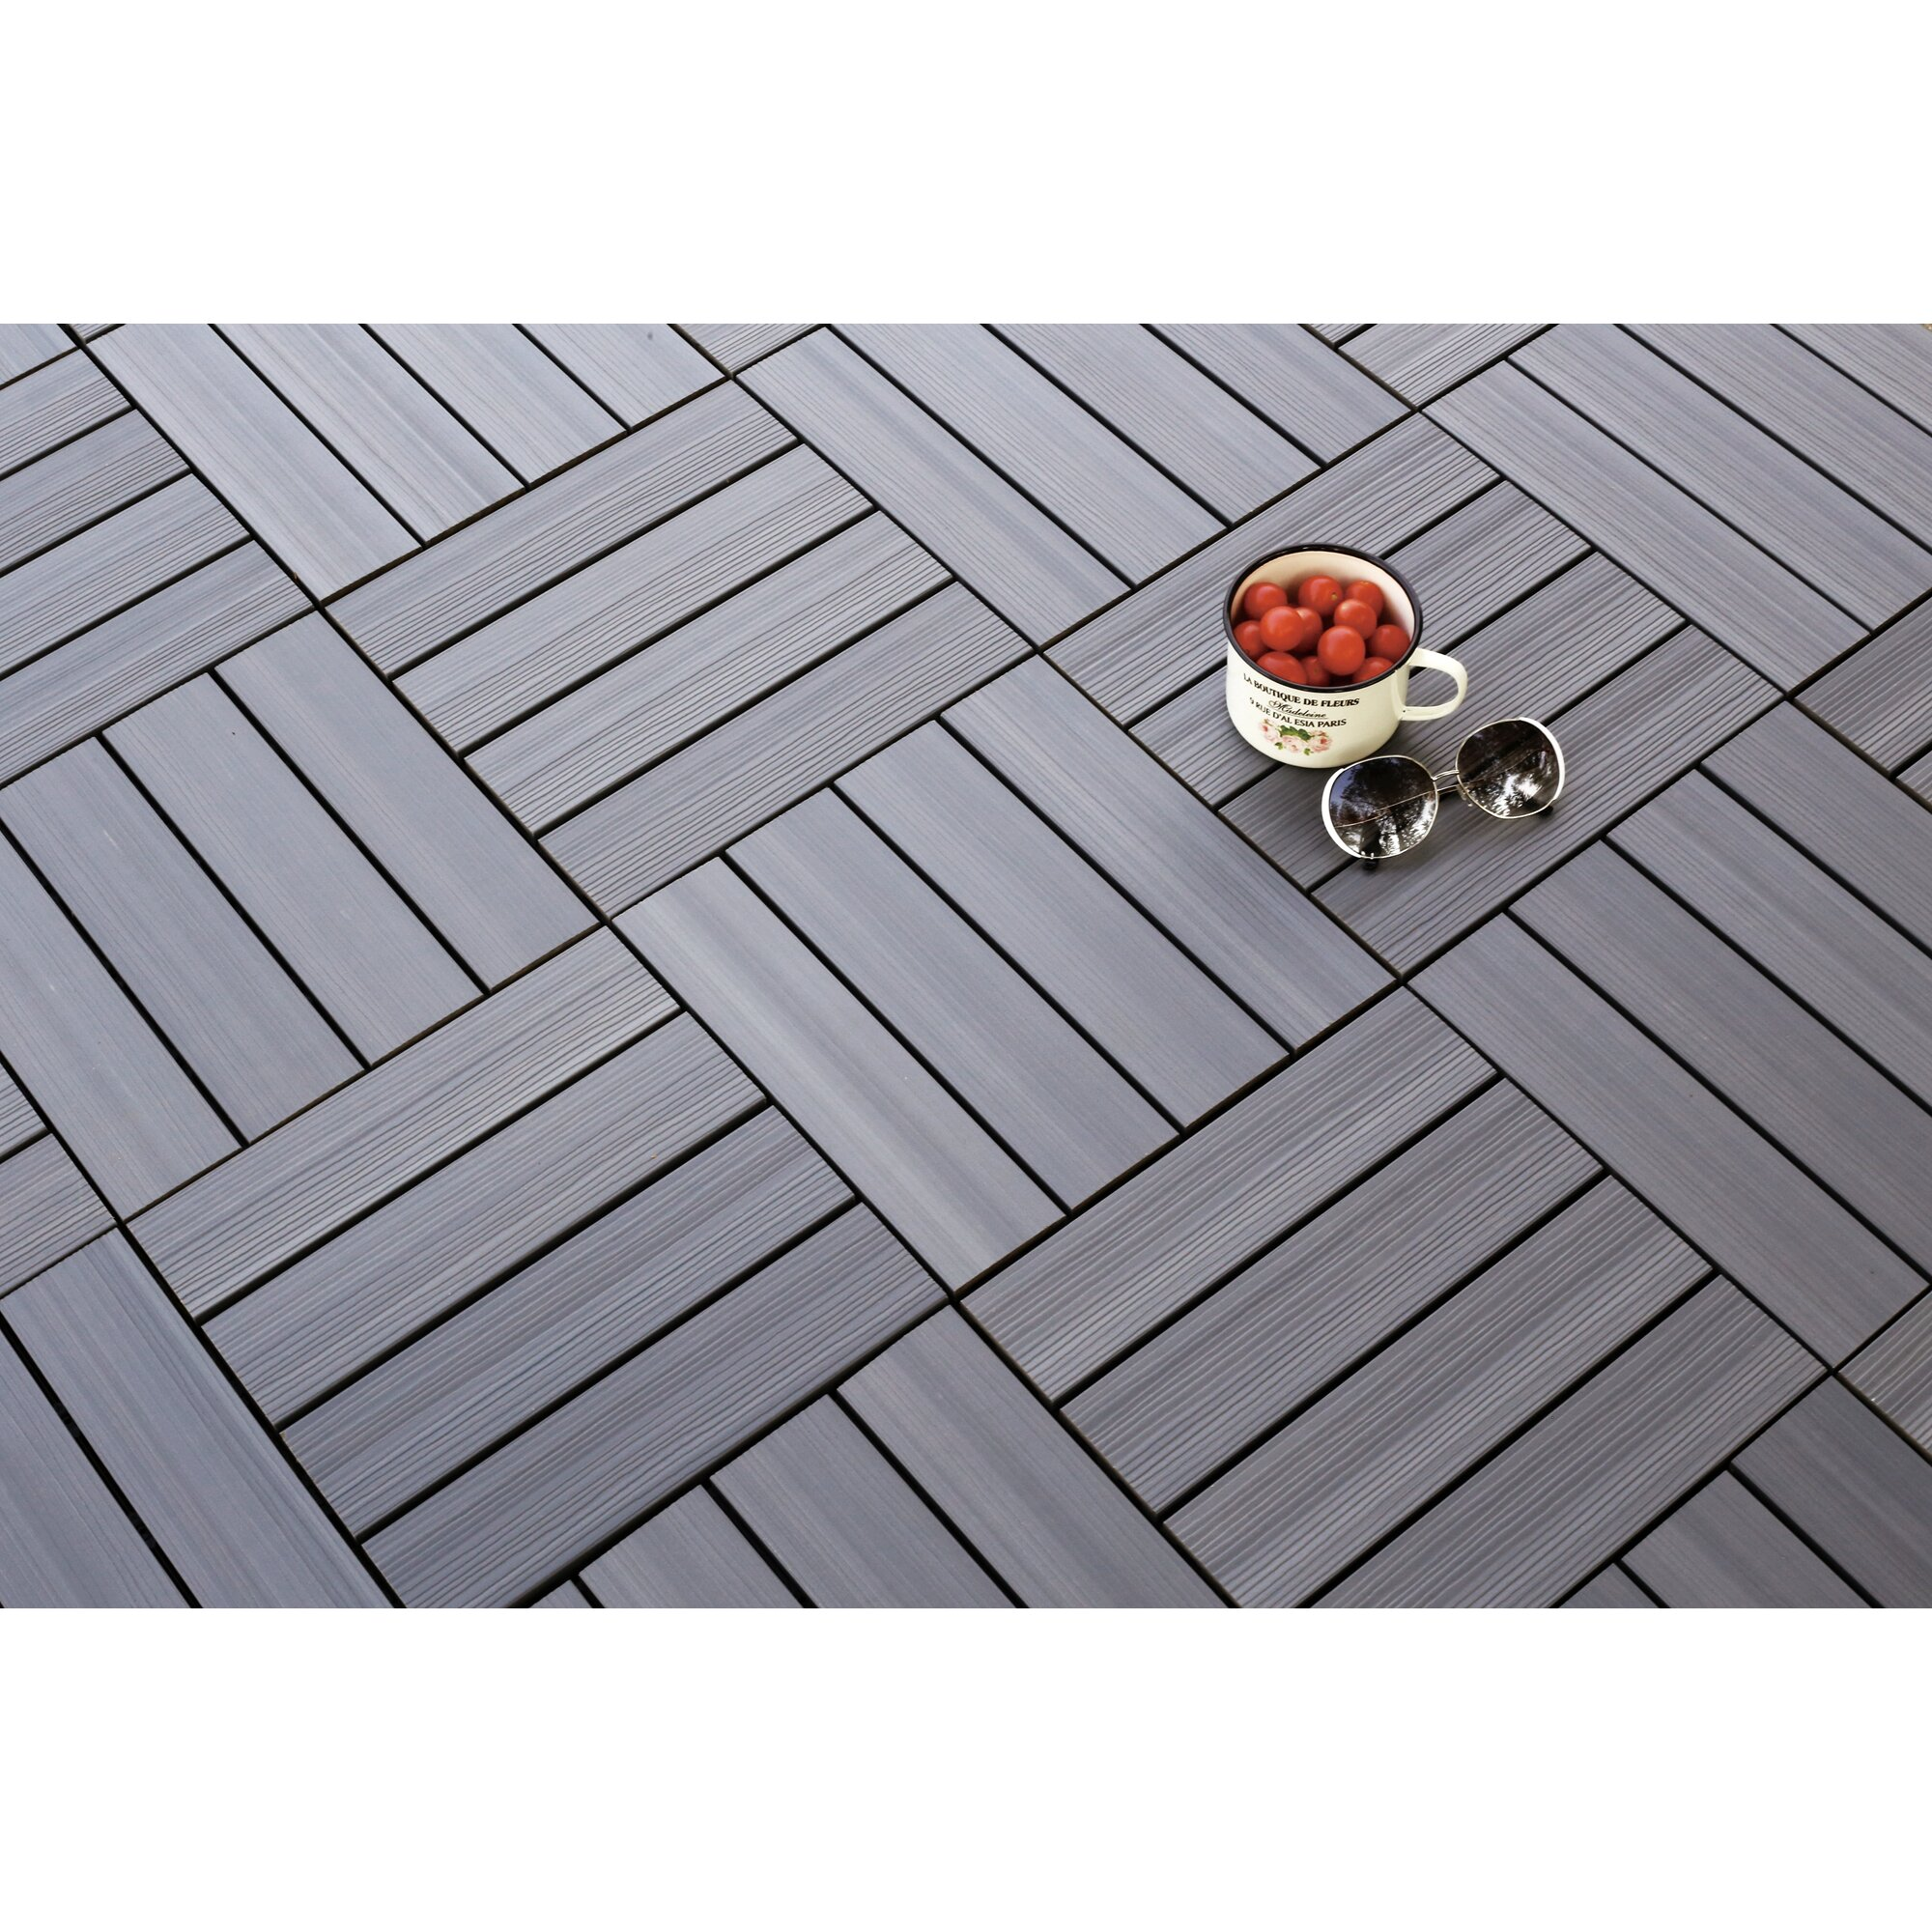 Interlocking floating outdoor carpet tiles meze blog carpet tiles newtechwood ultrashield westminster wood 12 x outdoor posite quick interlocking baanklon Image collections